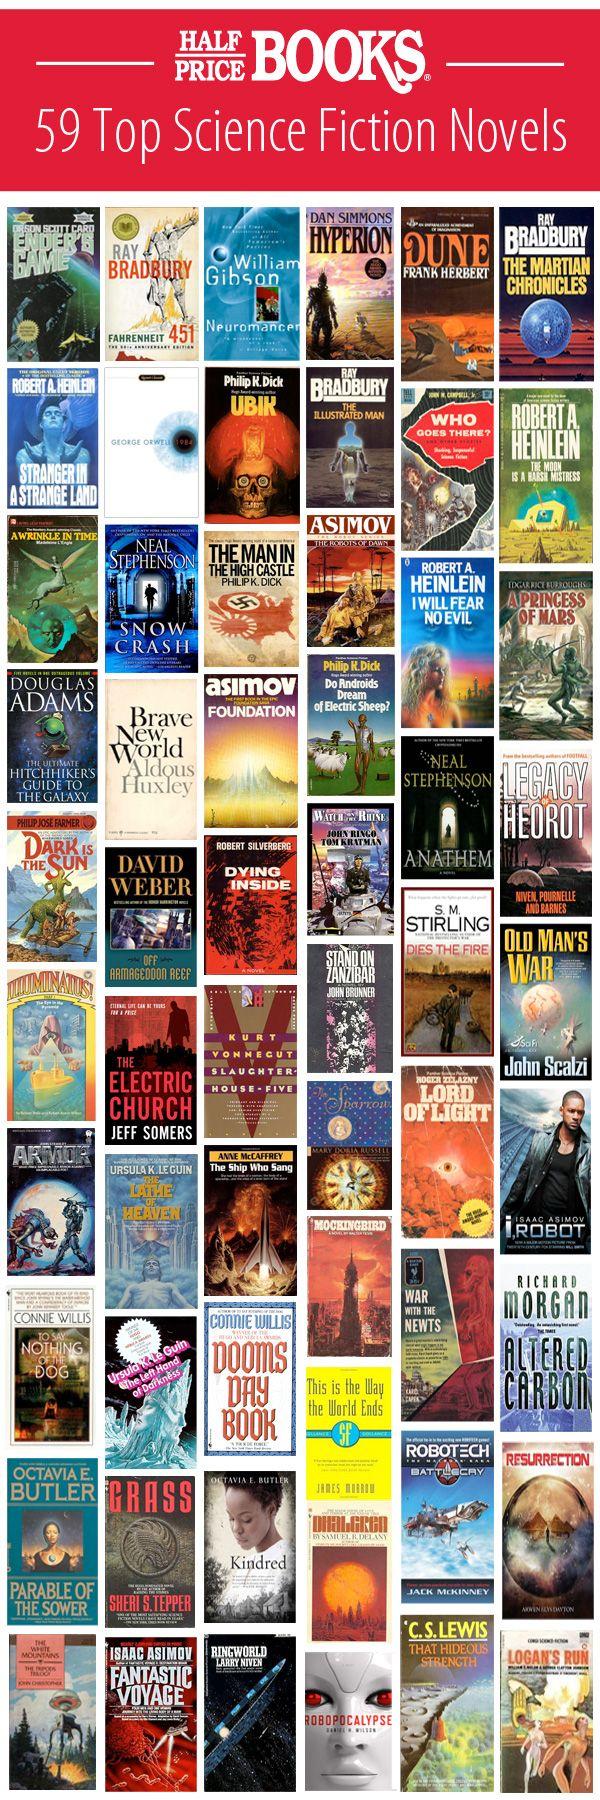 Writing science fiction novels